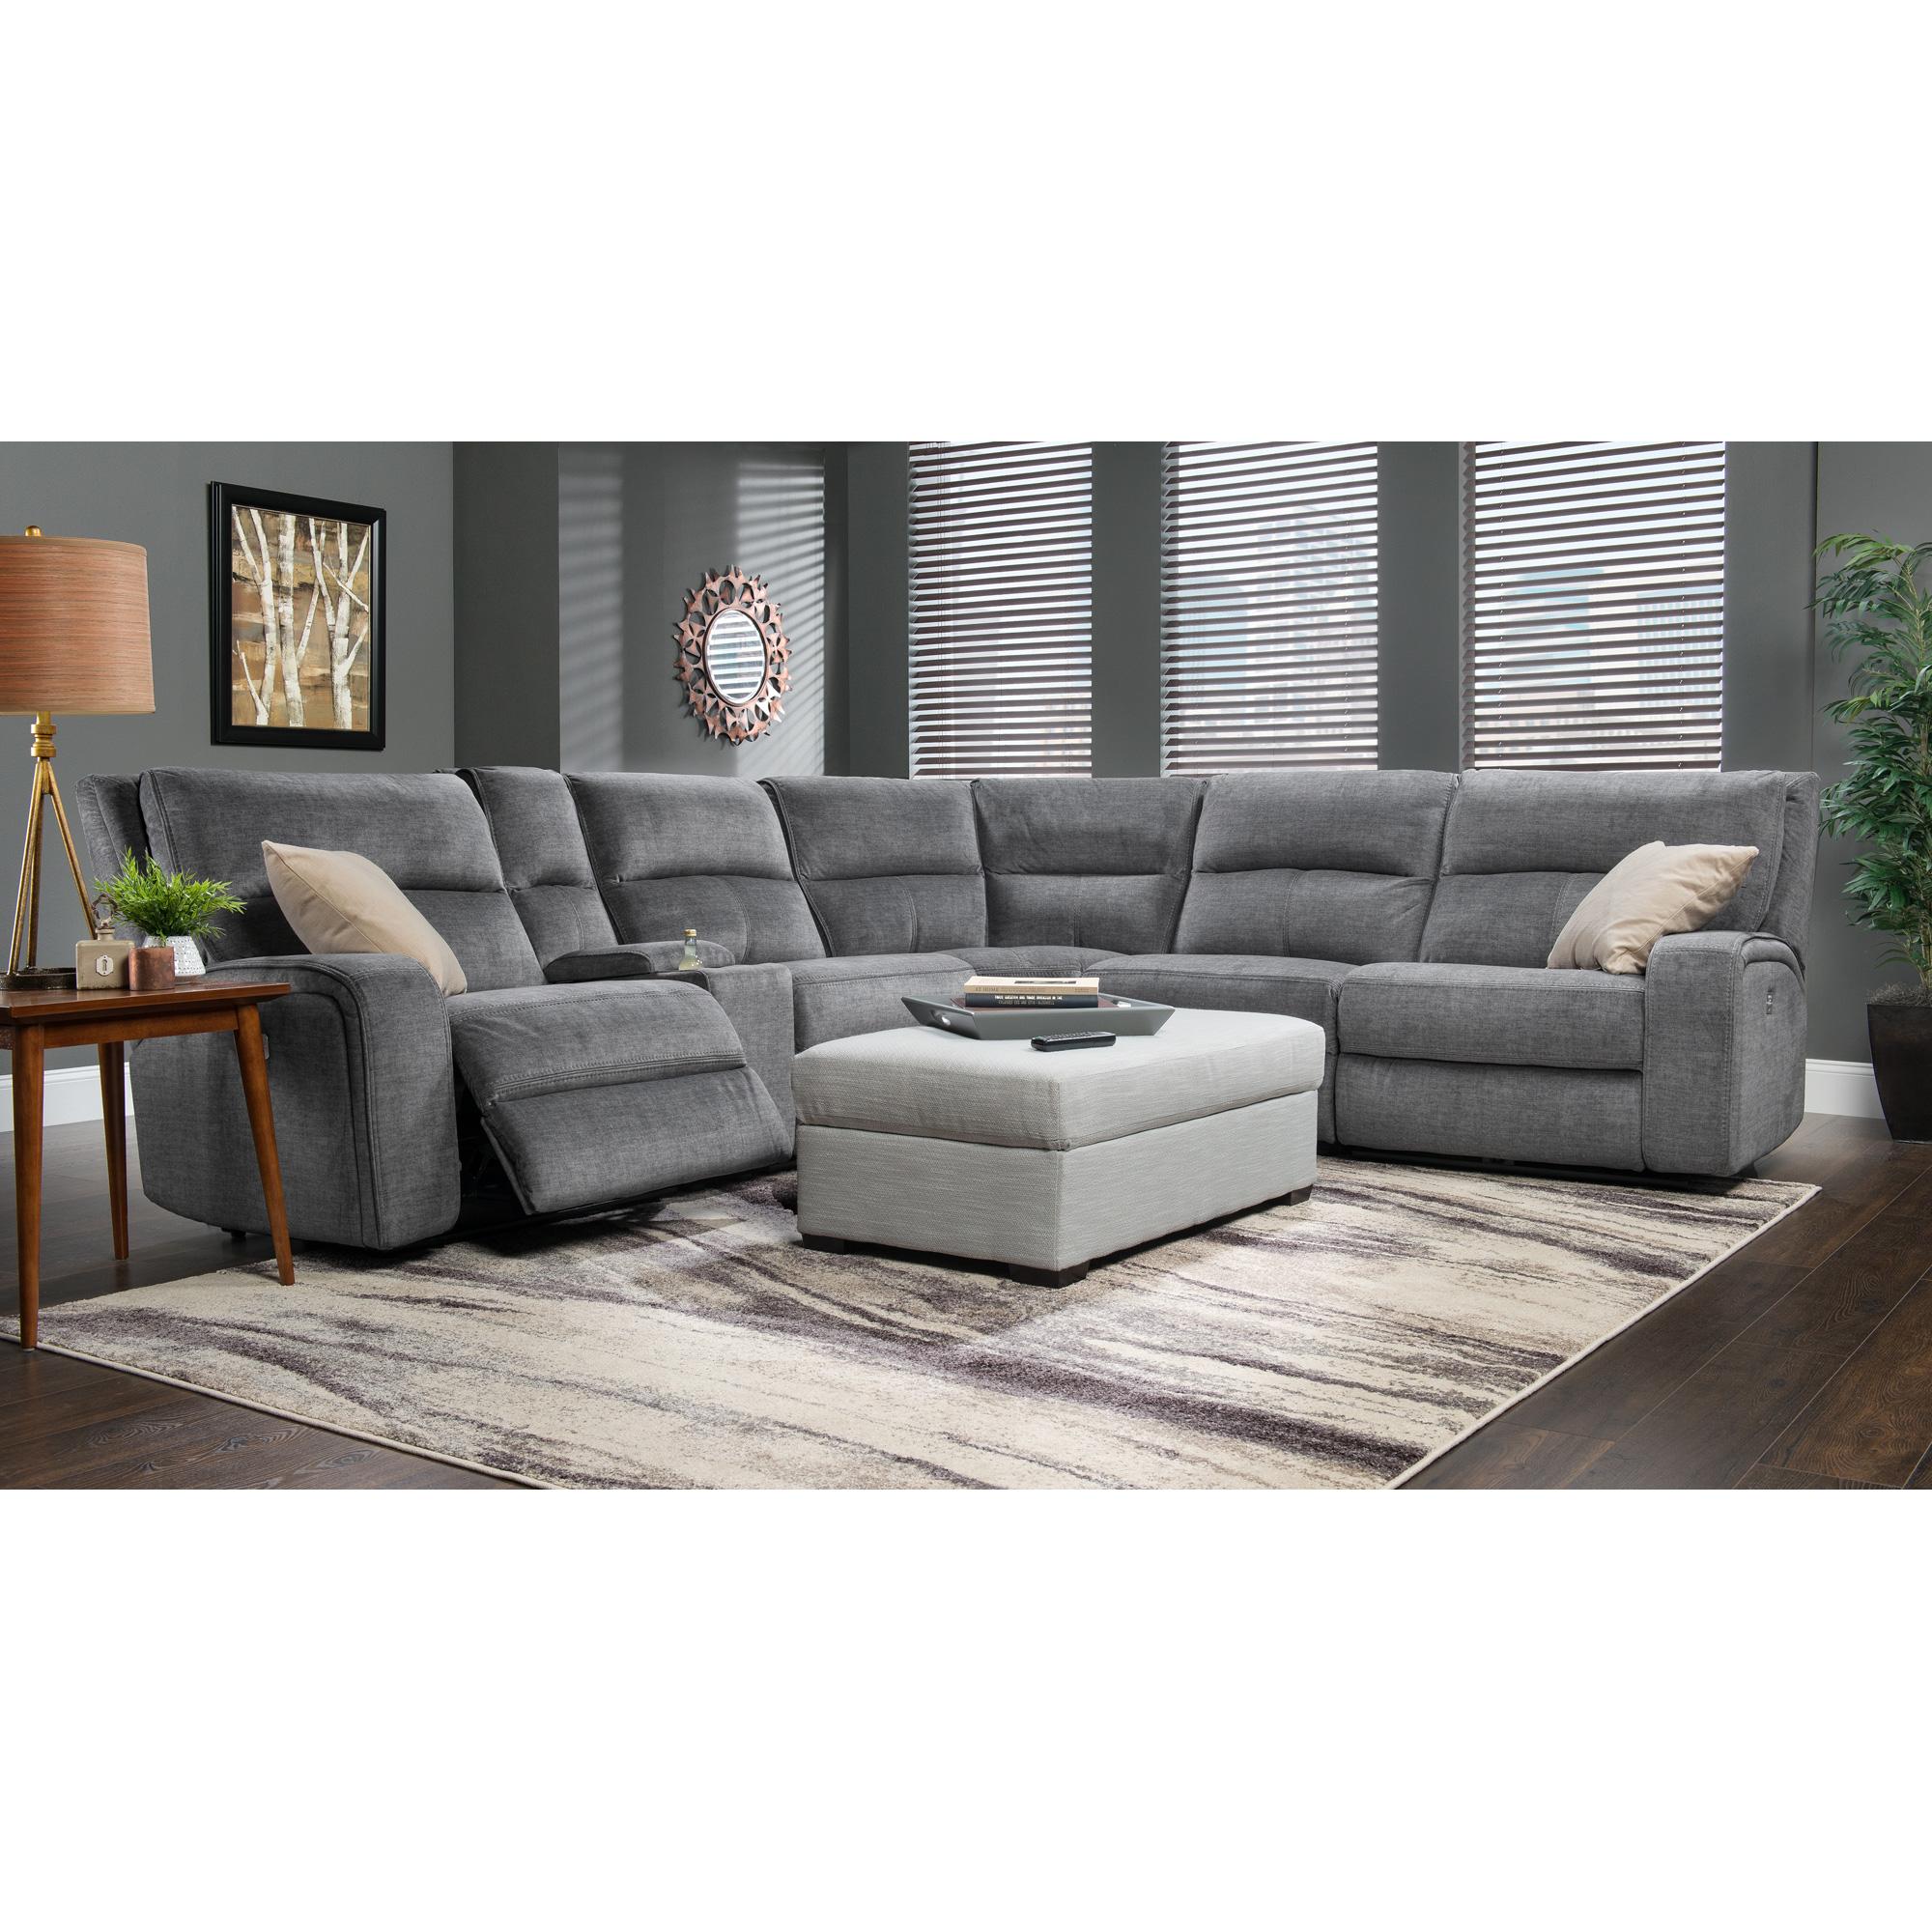 Wah Cheers | Cordova Charcoal Power+ 6 Piece Sectional Sofa